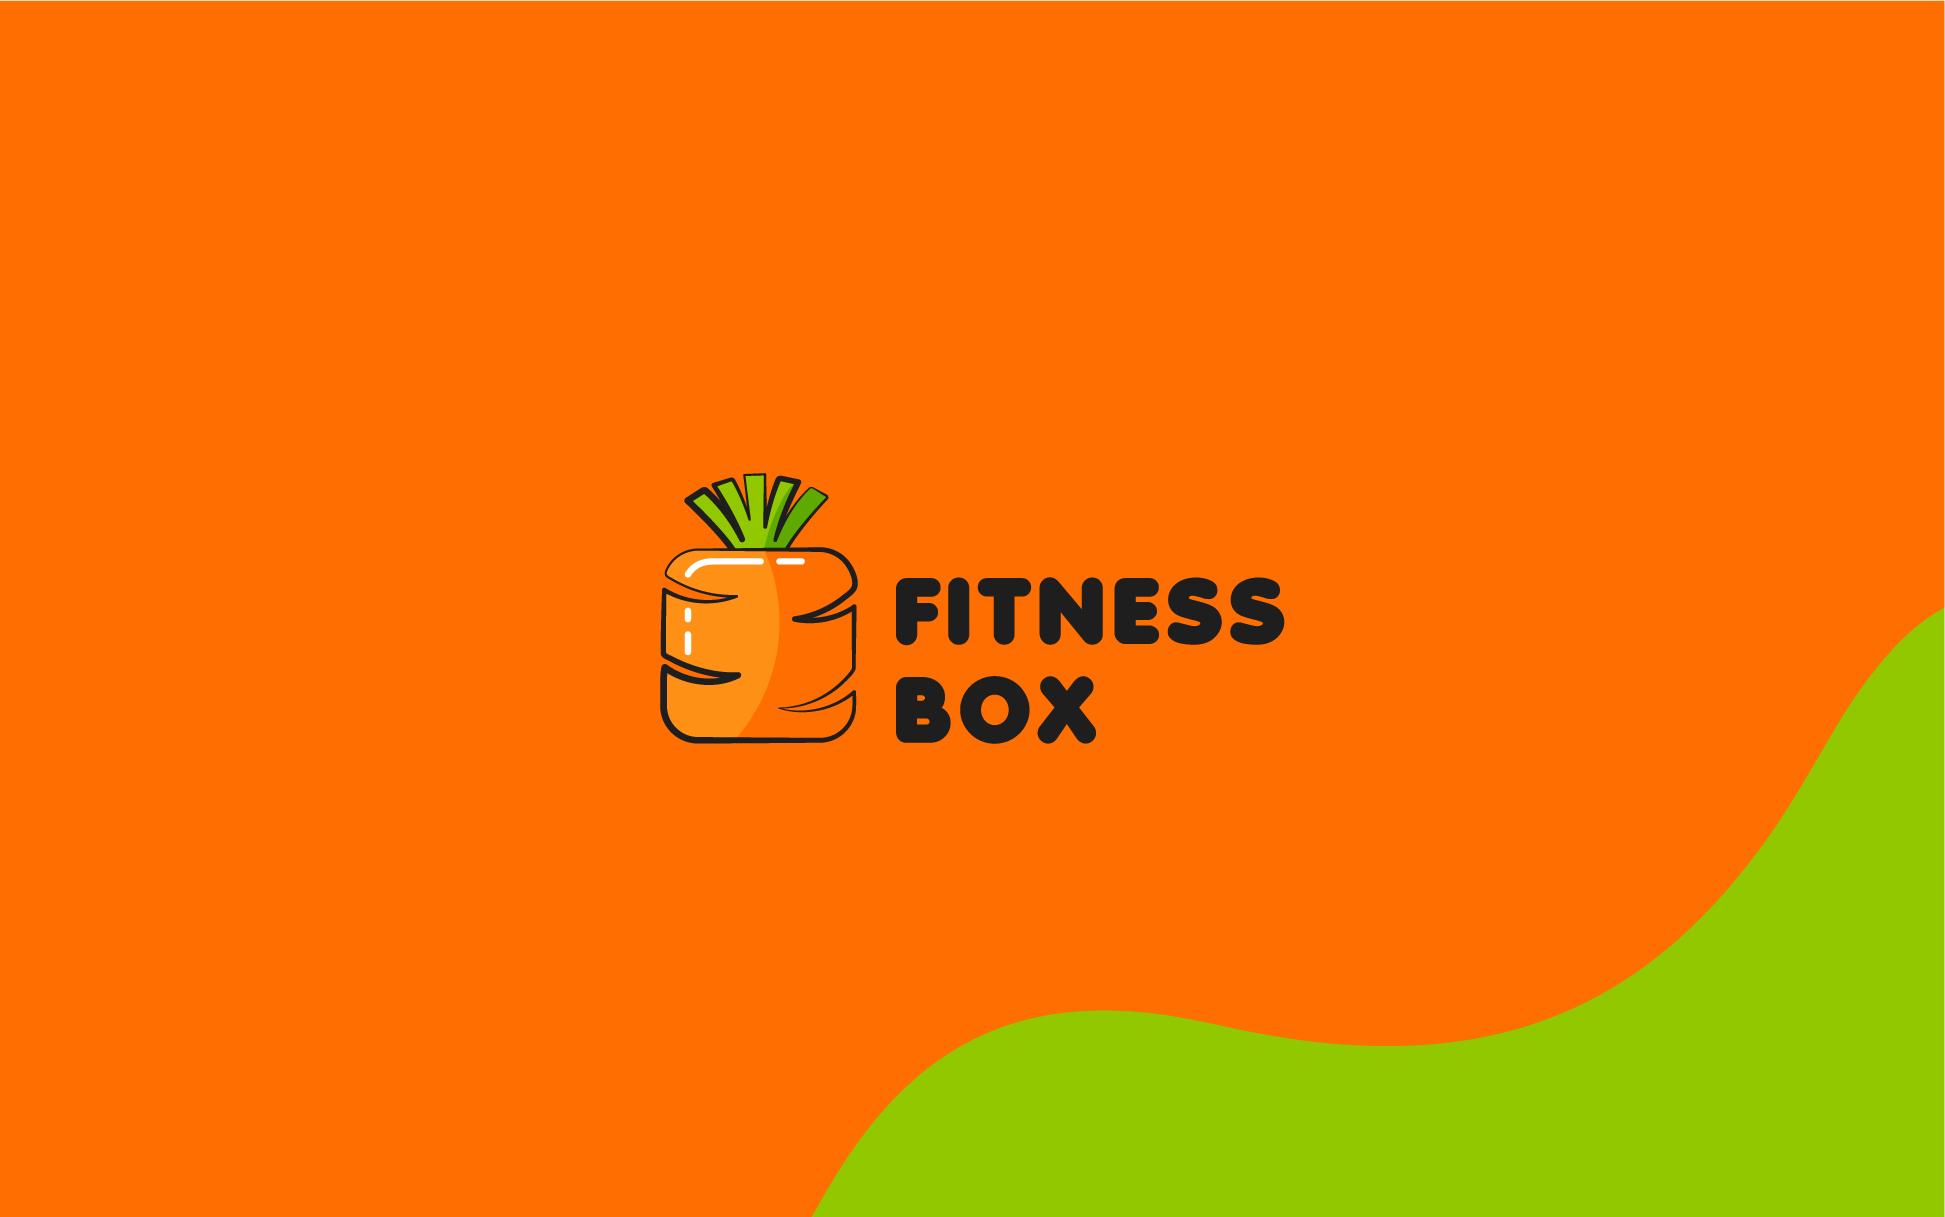 fitness box 1